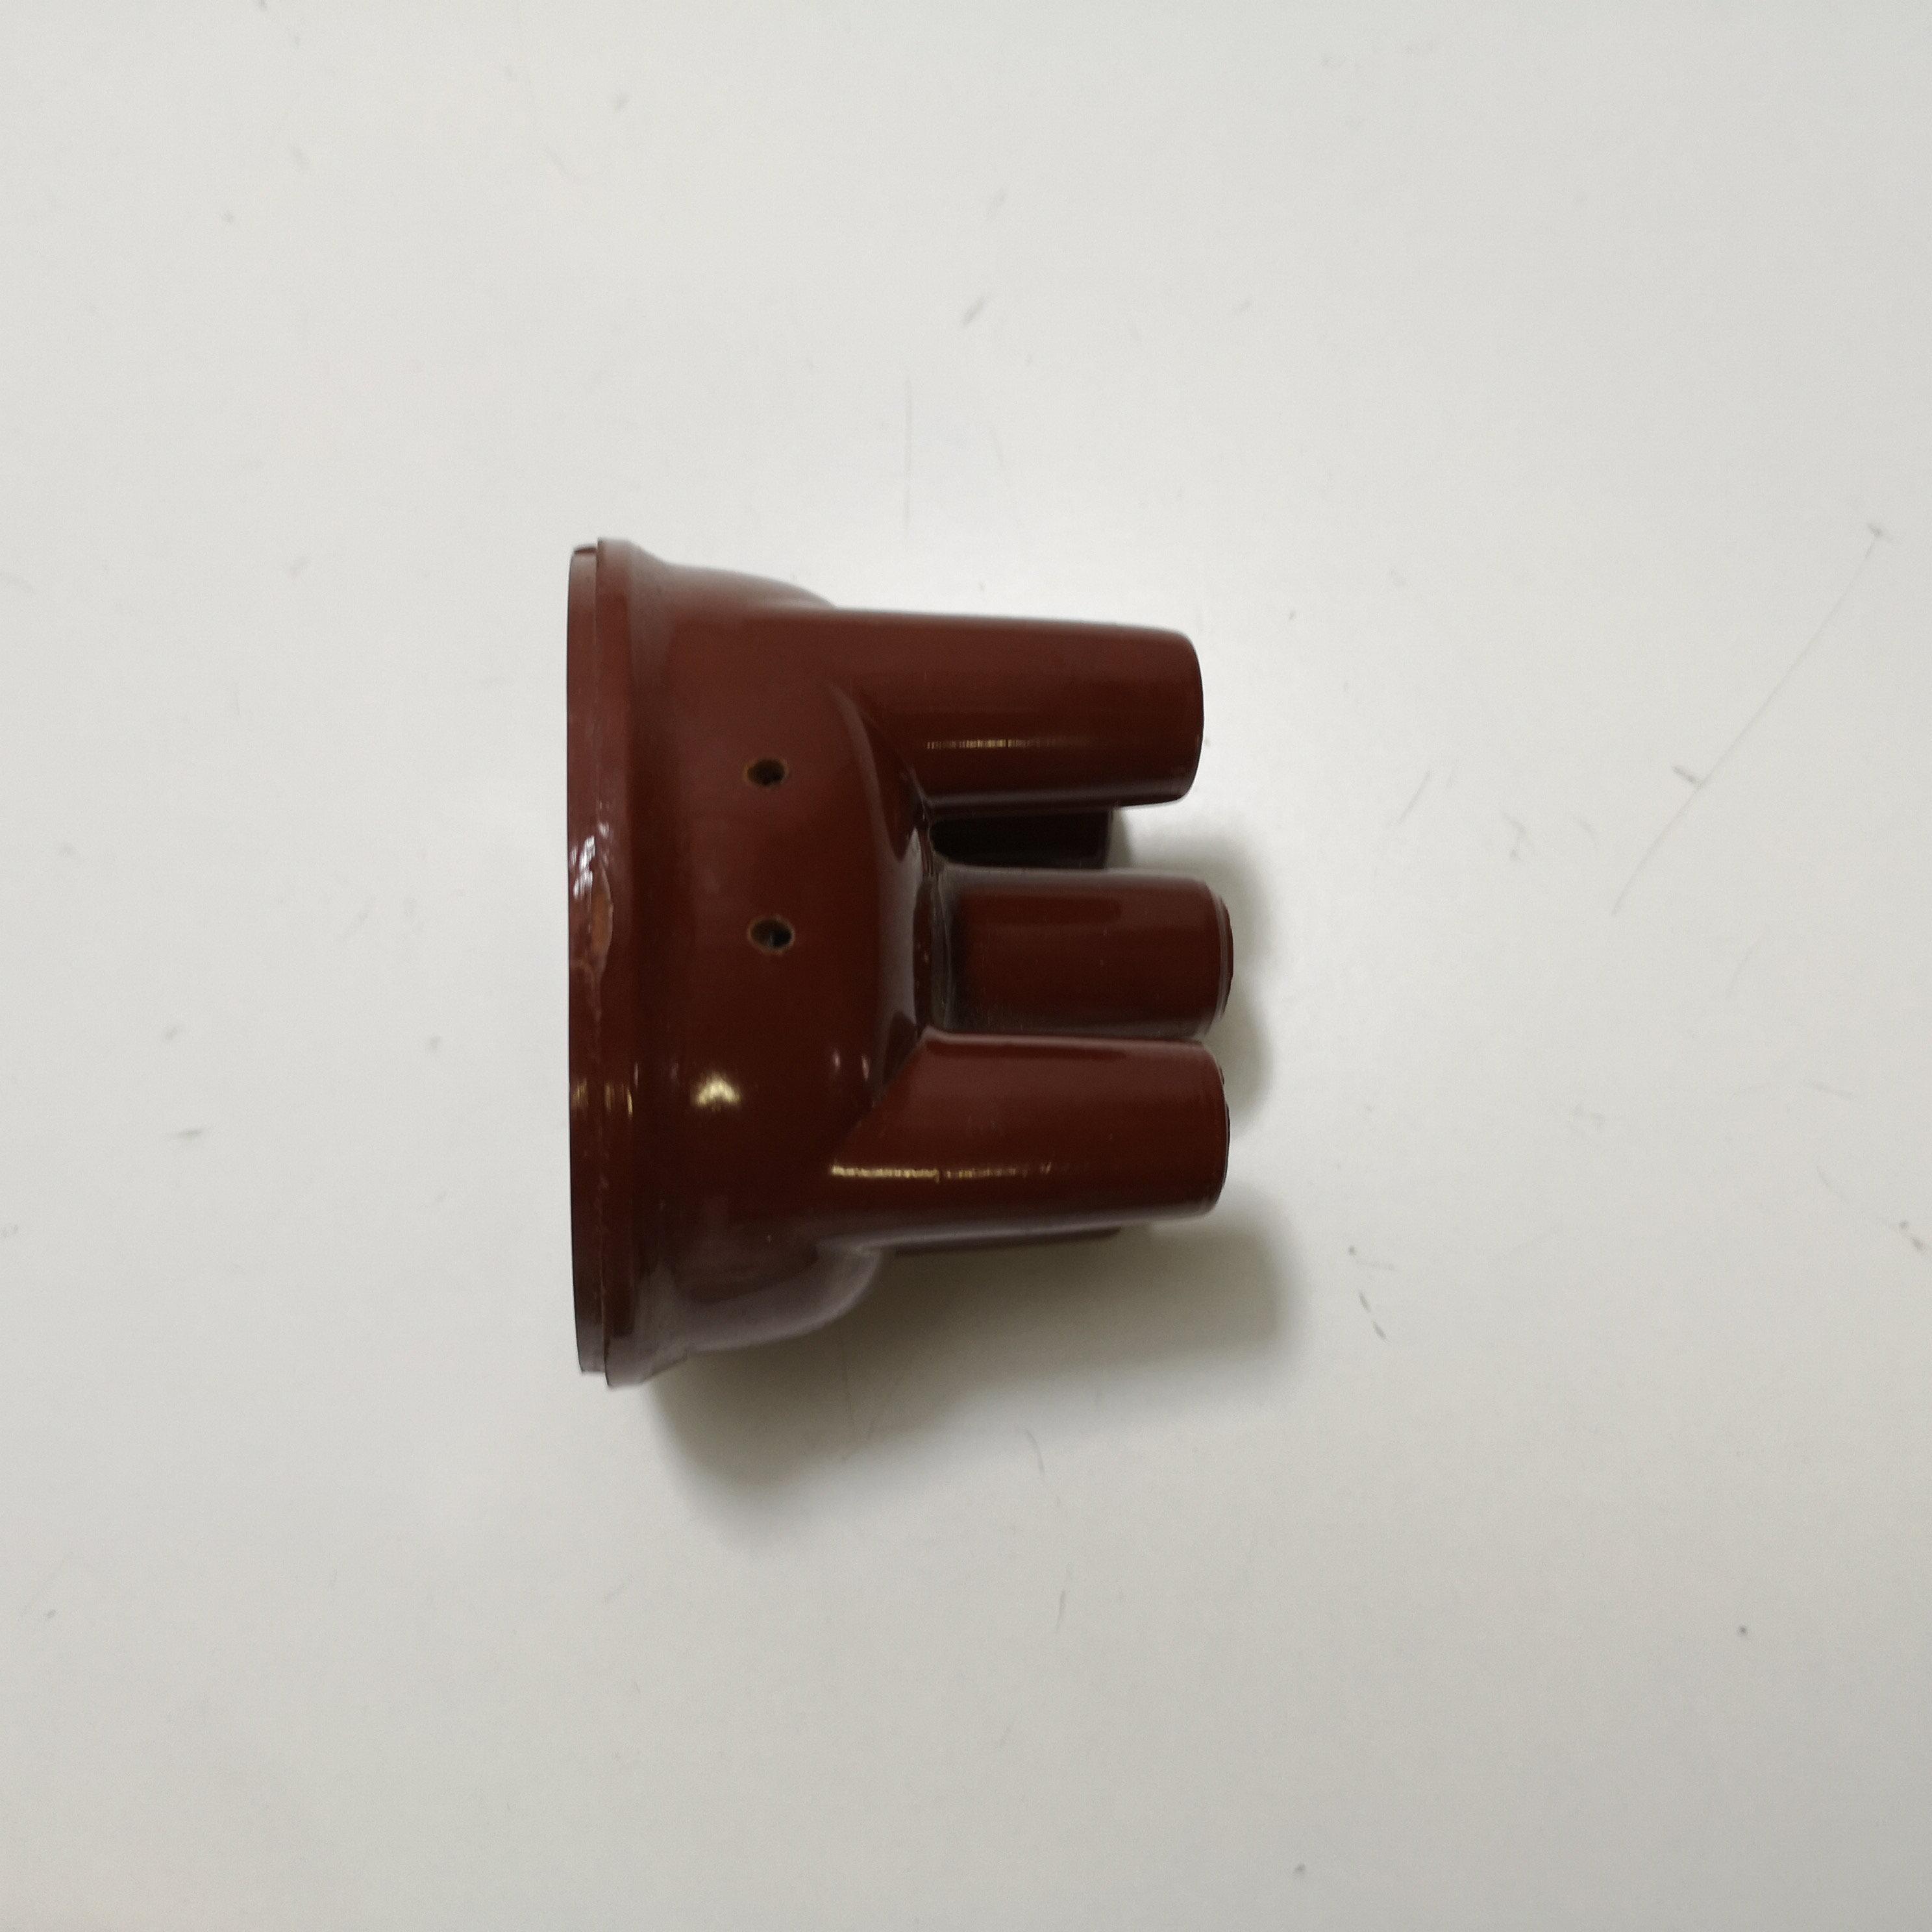 Manija de puerta mango vigas subalmacén vigas perchas bmw x5 e53 51228243636 trasera derecha nuevo